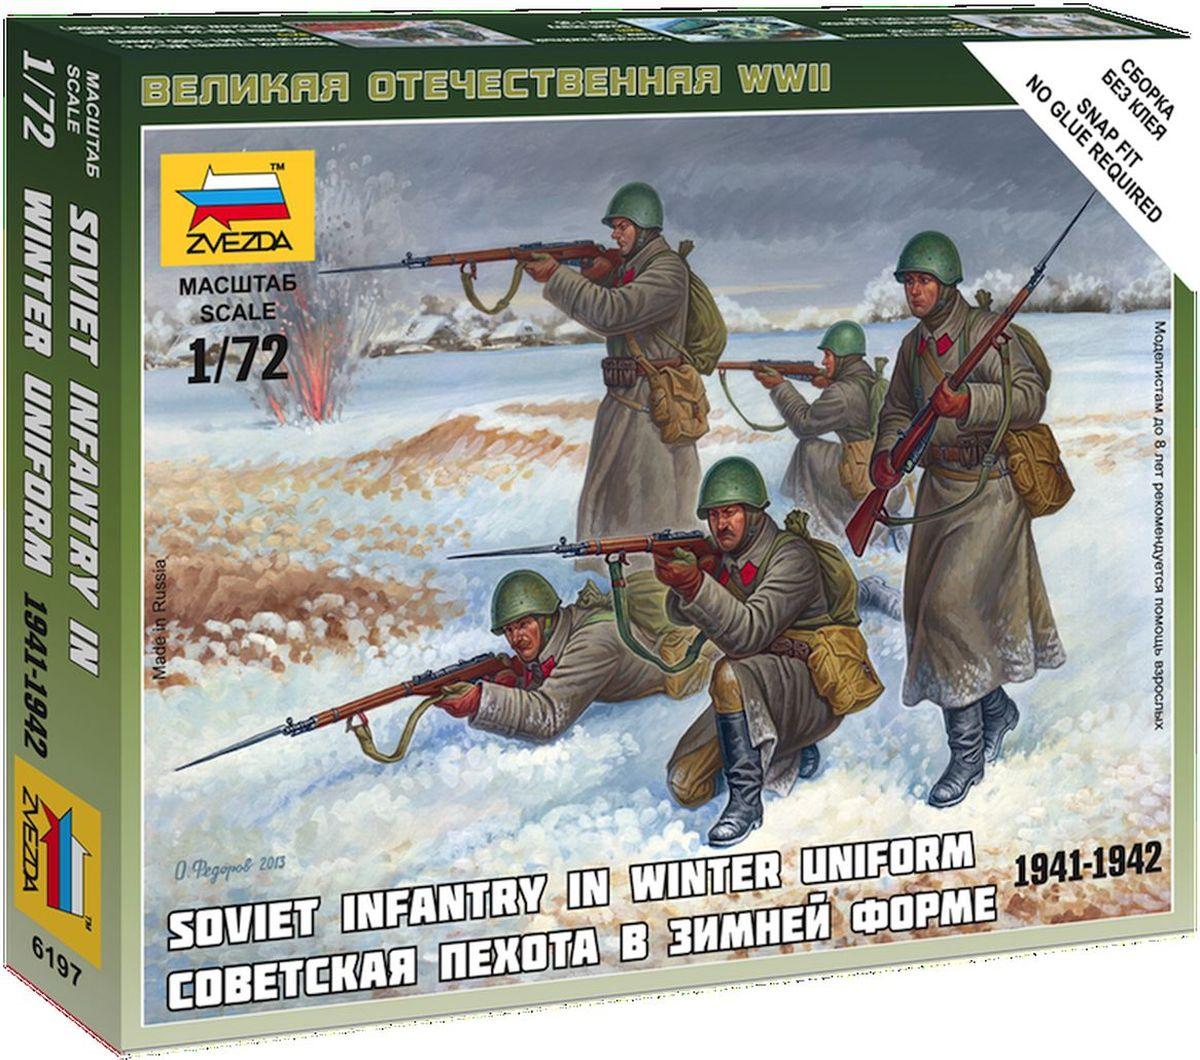 ������ ������� ������ ��������� ������ � ������ ����� 1941-1942